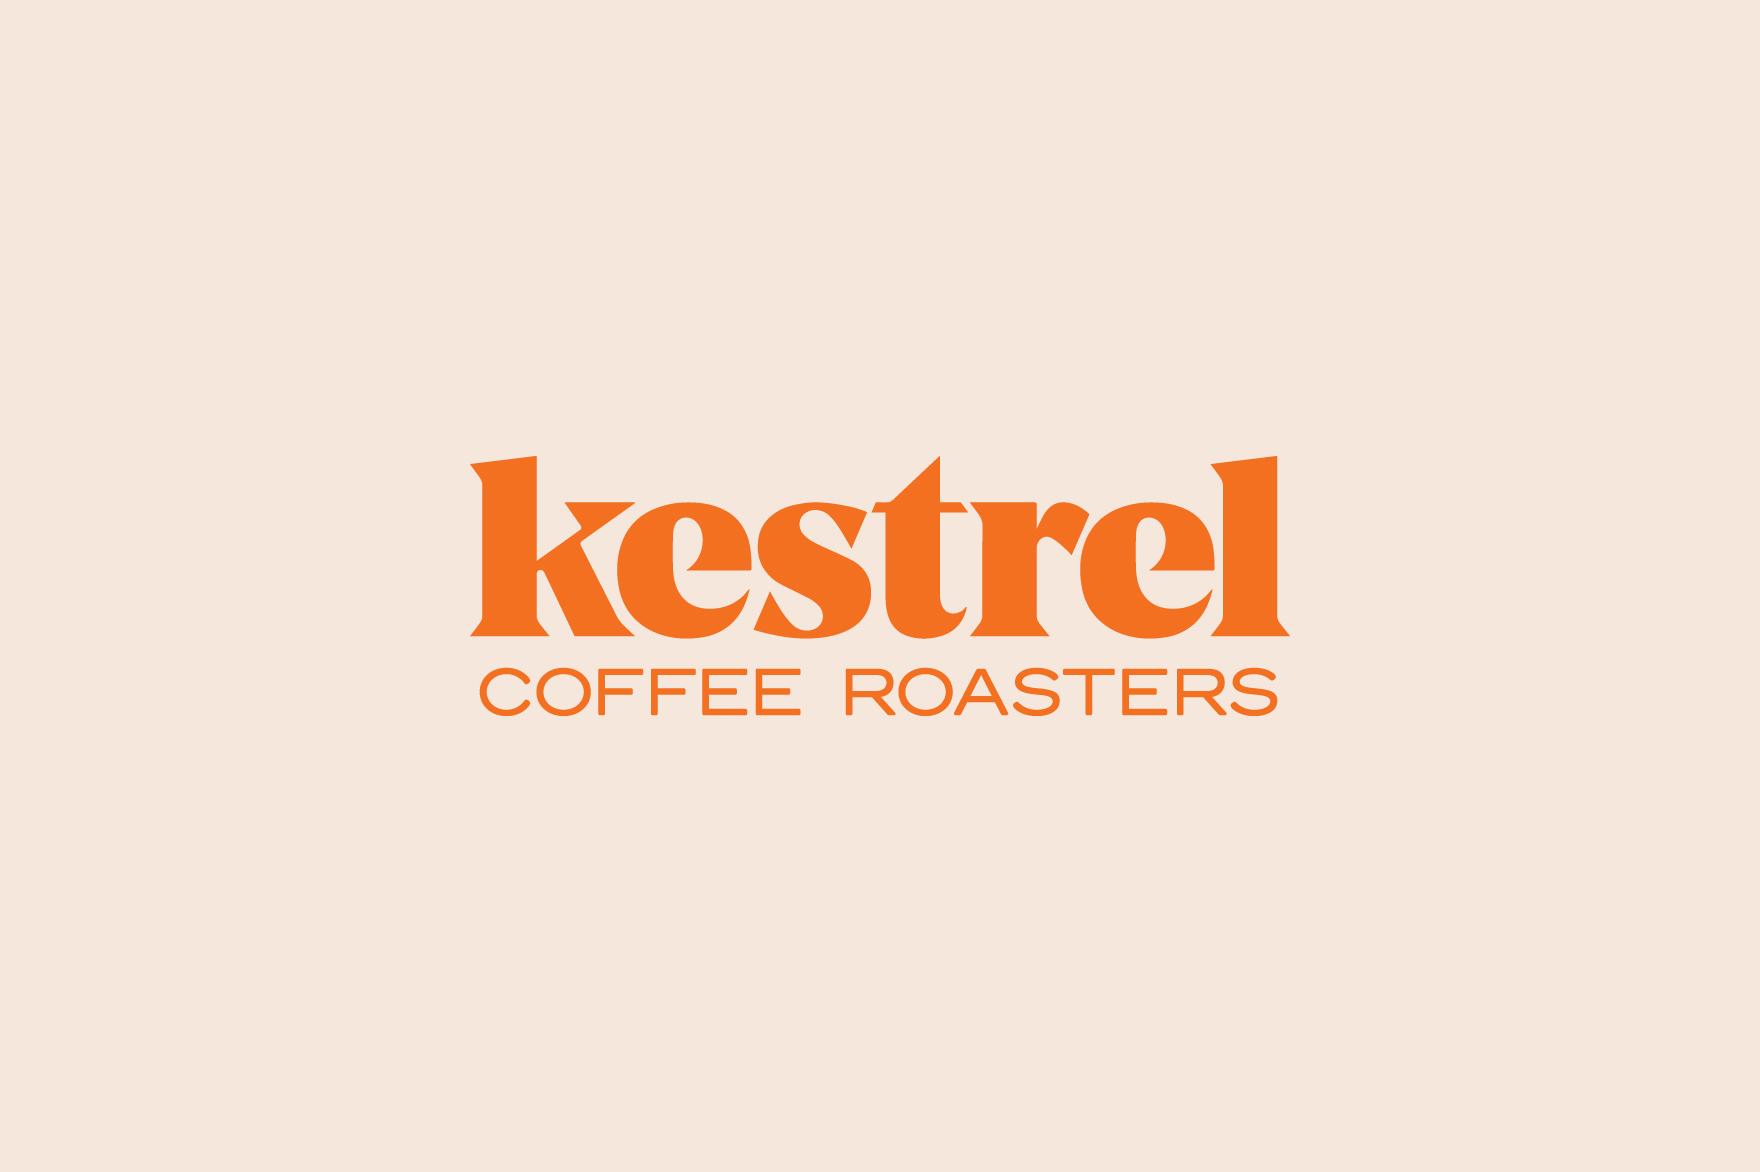 Kestrel Coffee Roasters